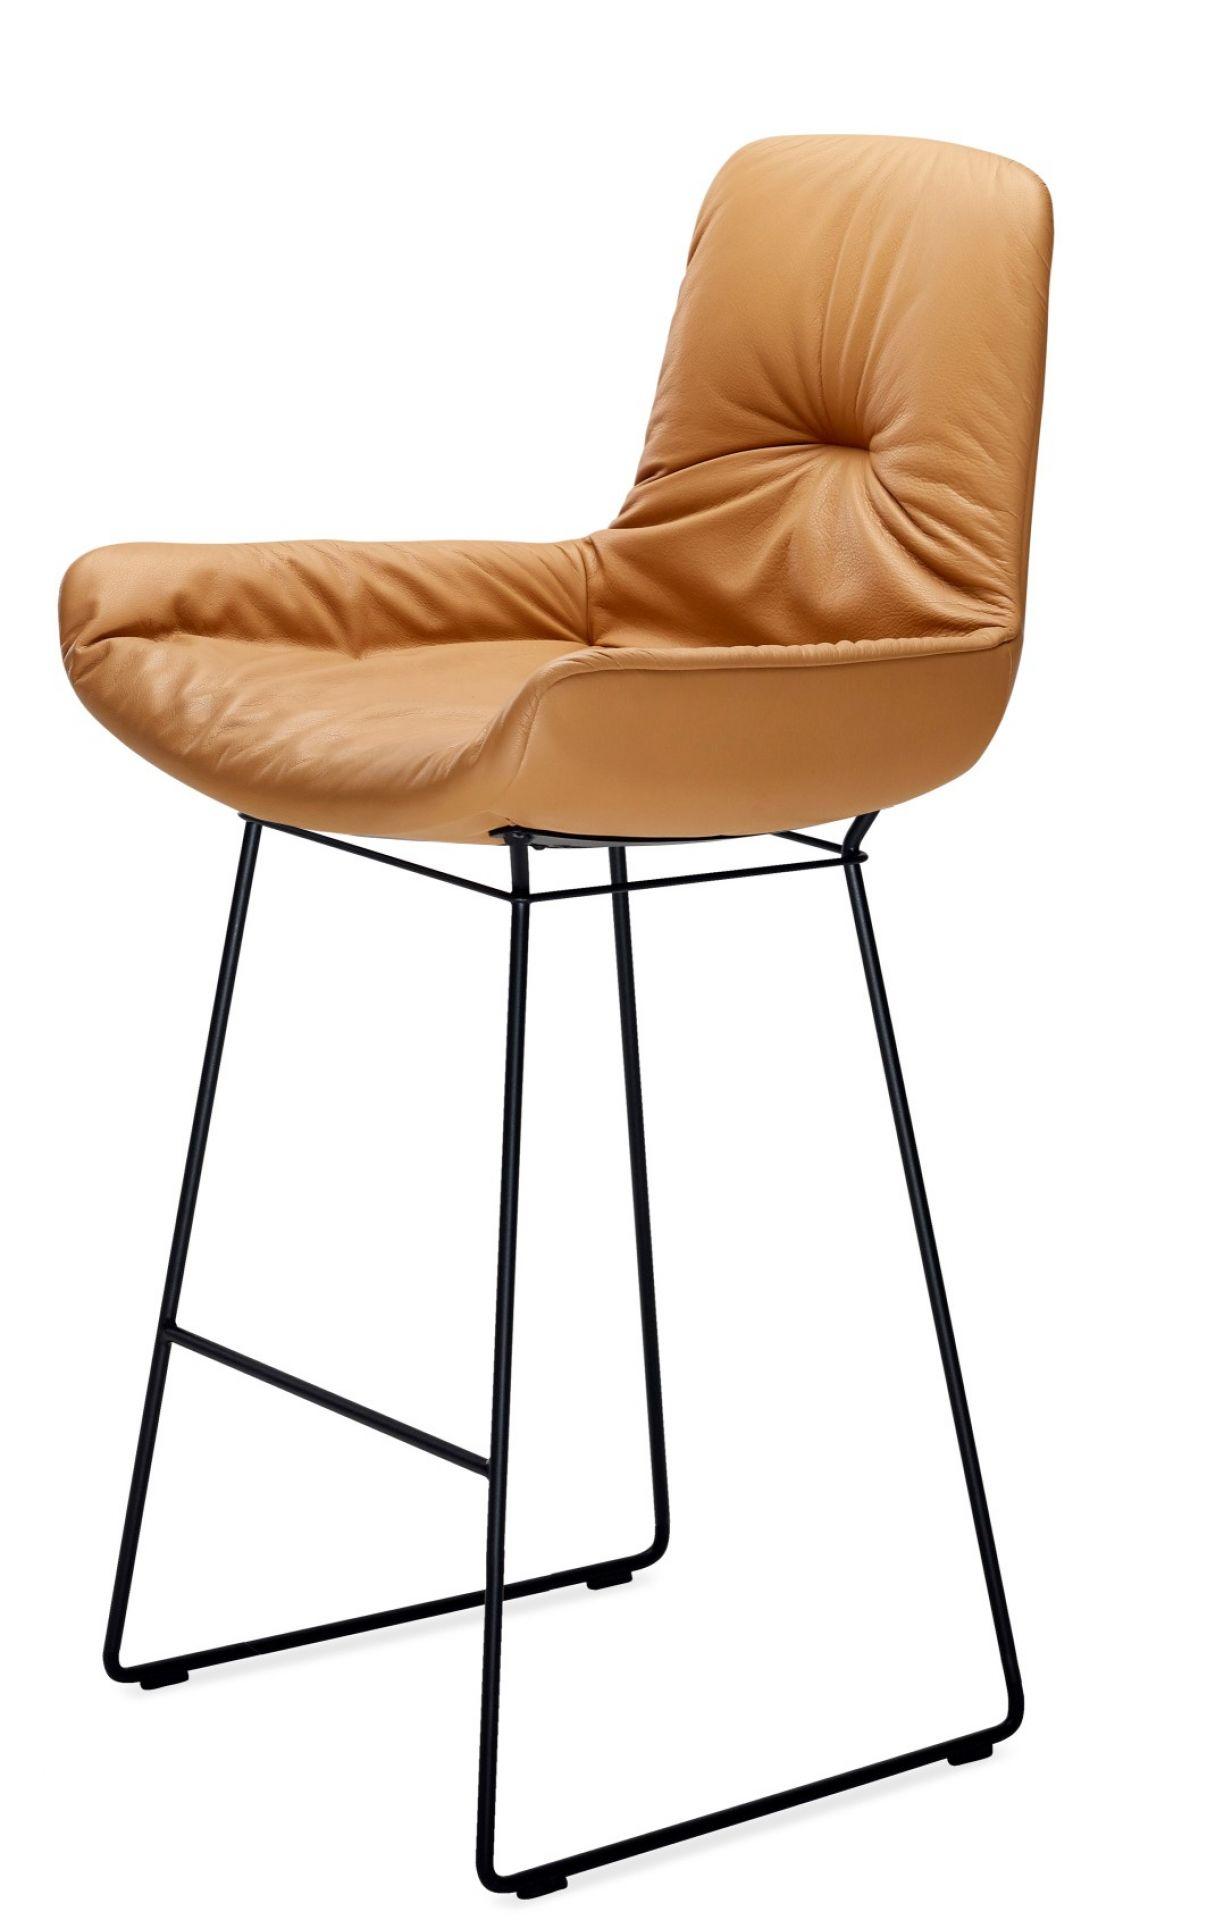 Leya Counter Armchair Low Barhocker Freifrau Sitzmöbelmanufaktur